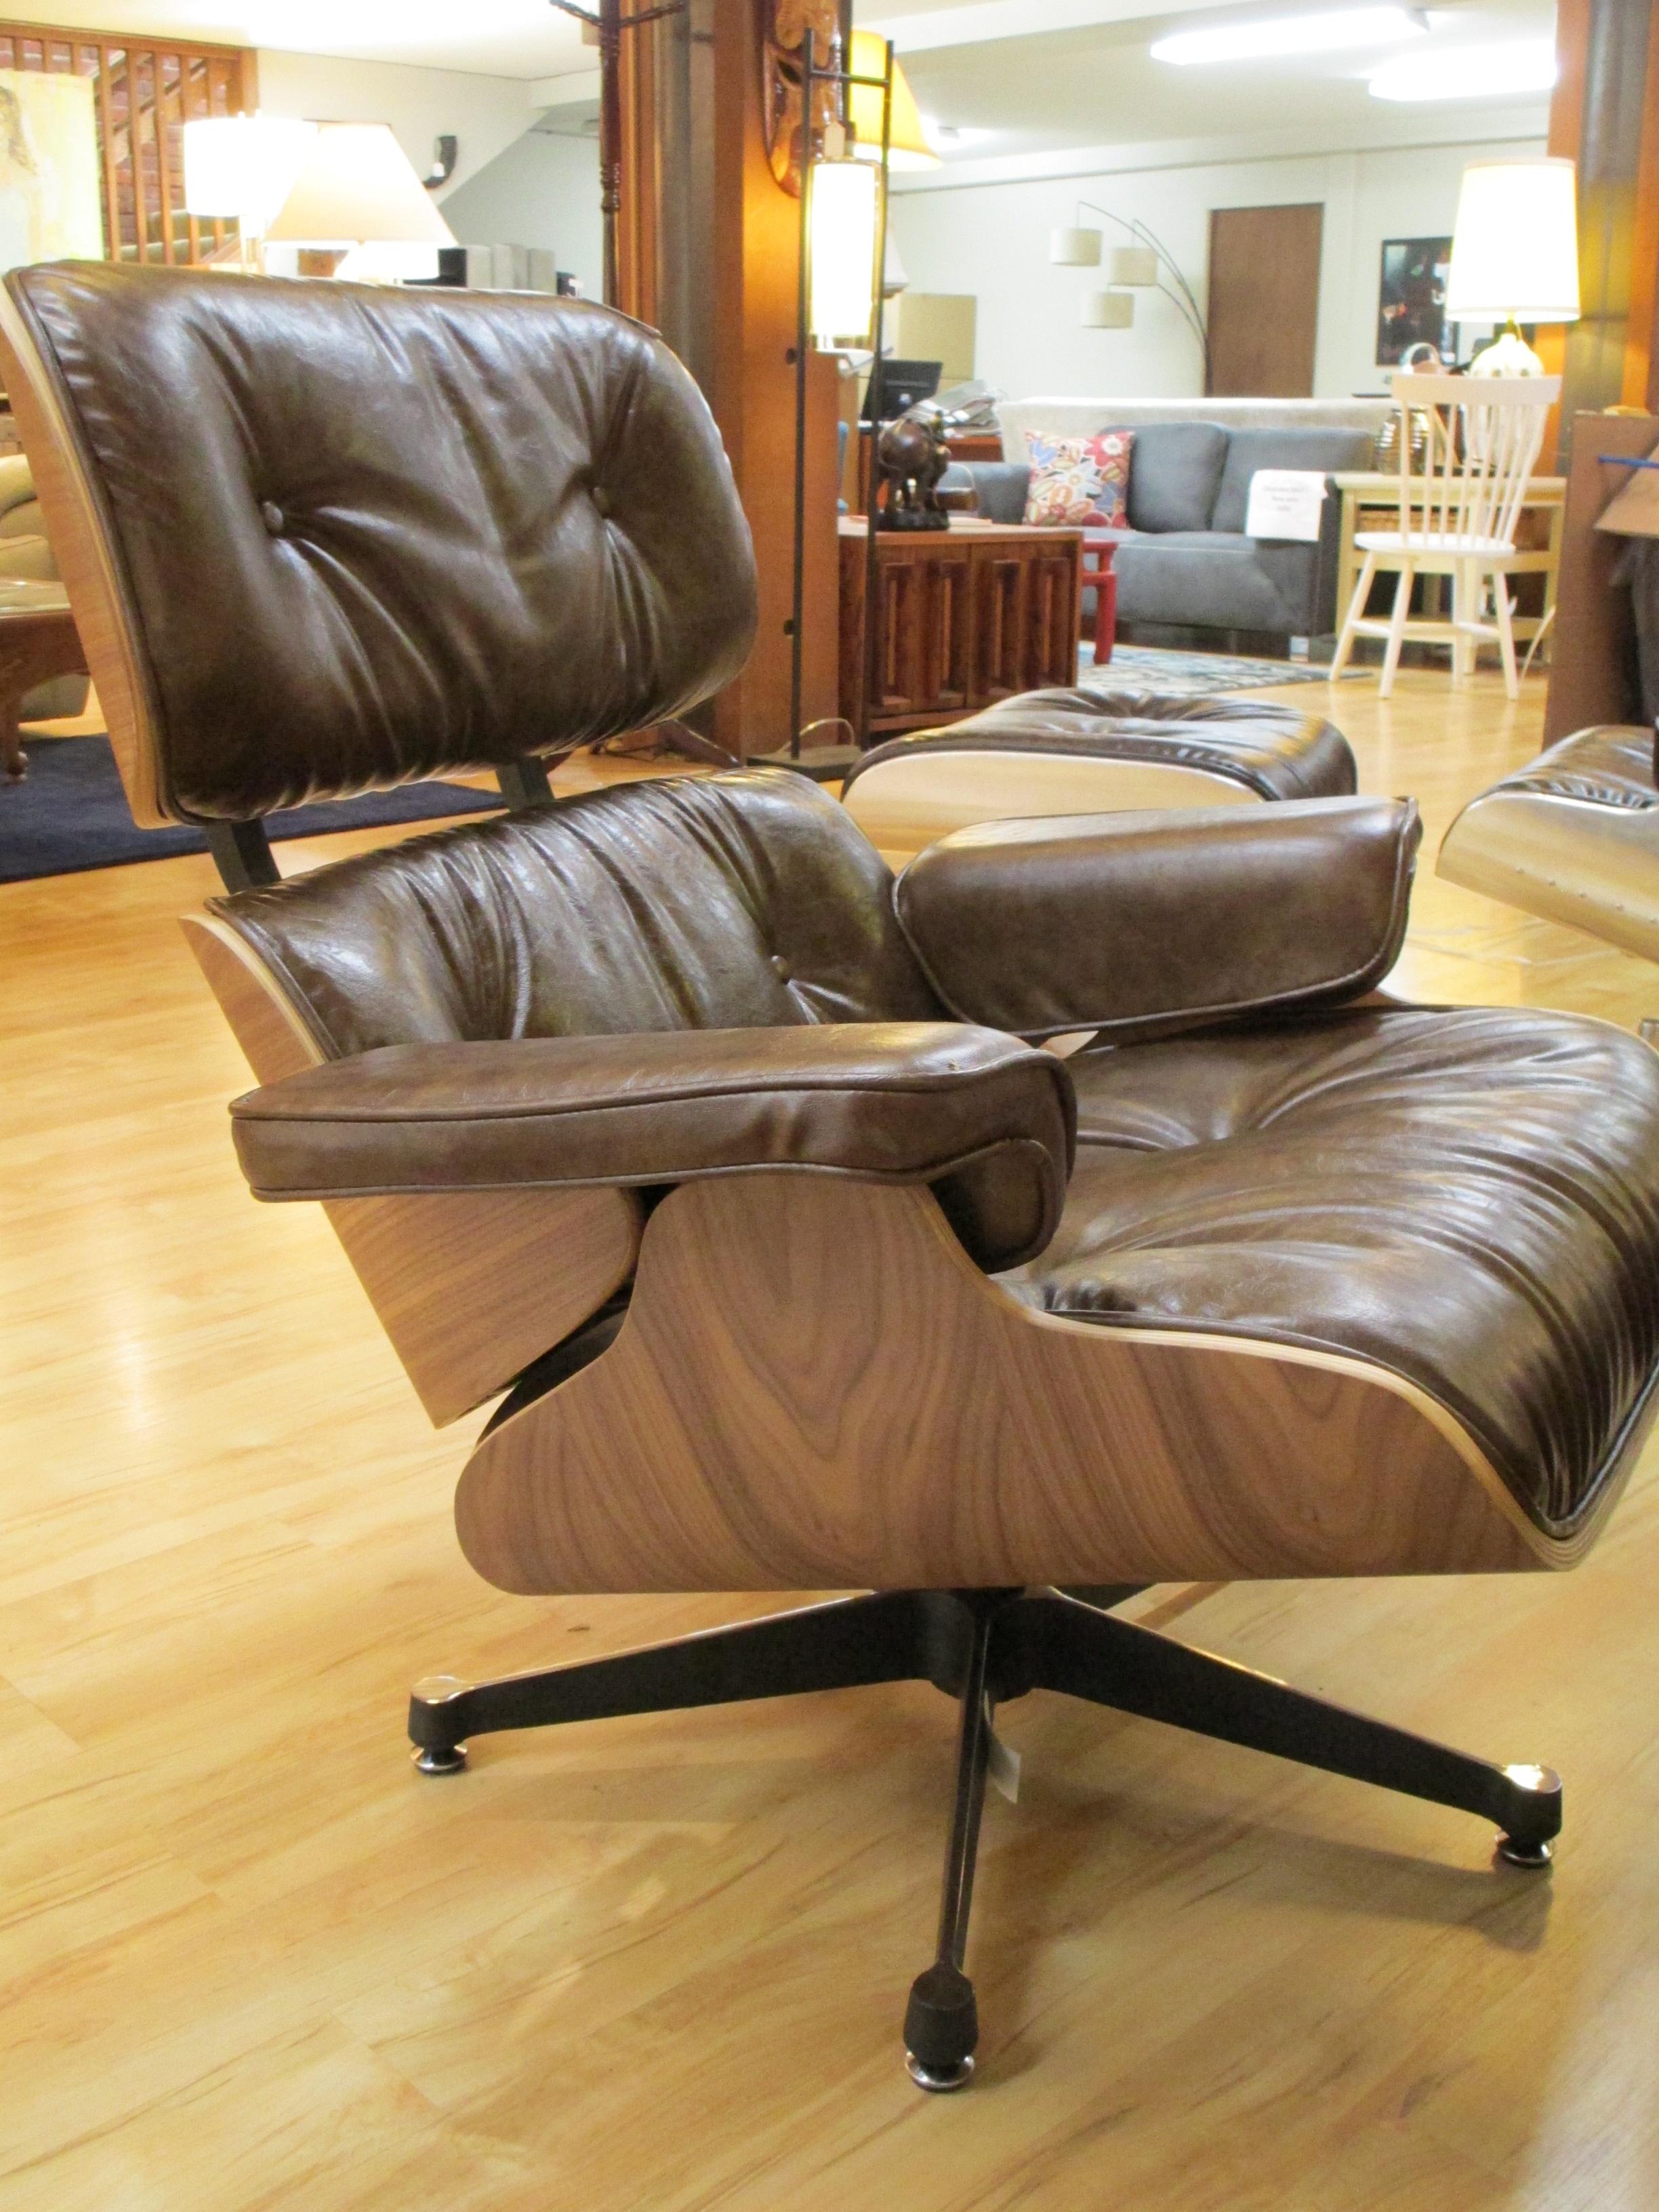 Manhattan Bentwood Lounge Chair W/ Ottoman U2013 SOLD